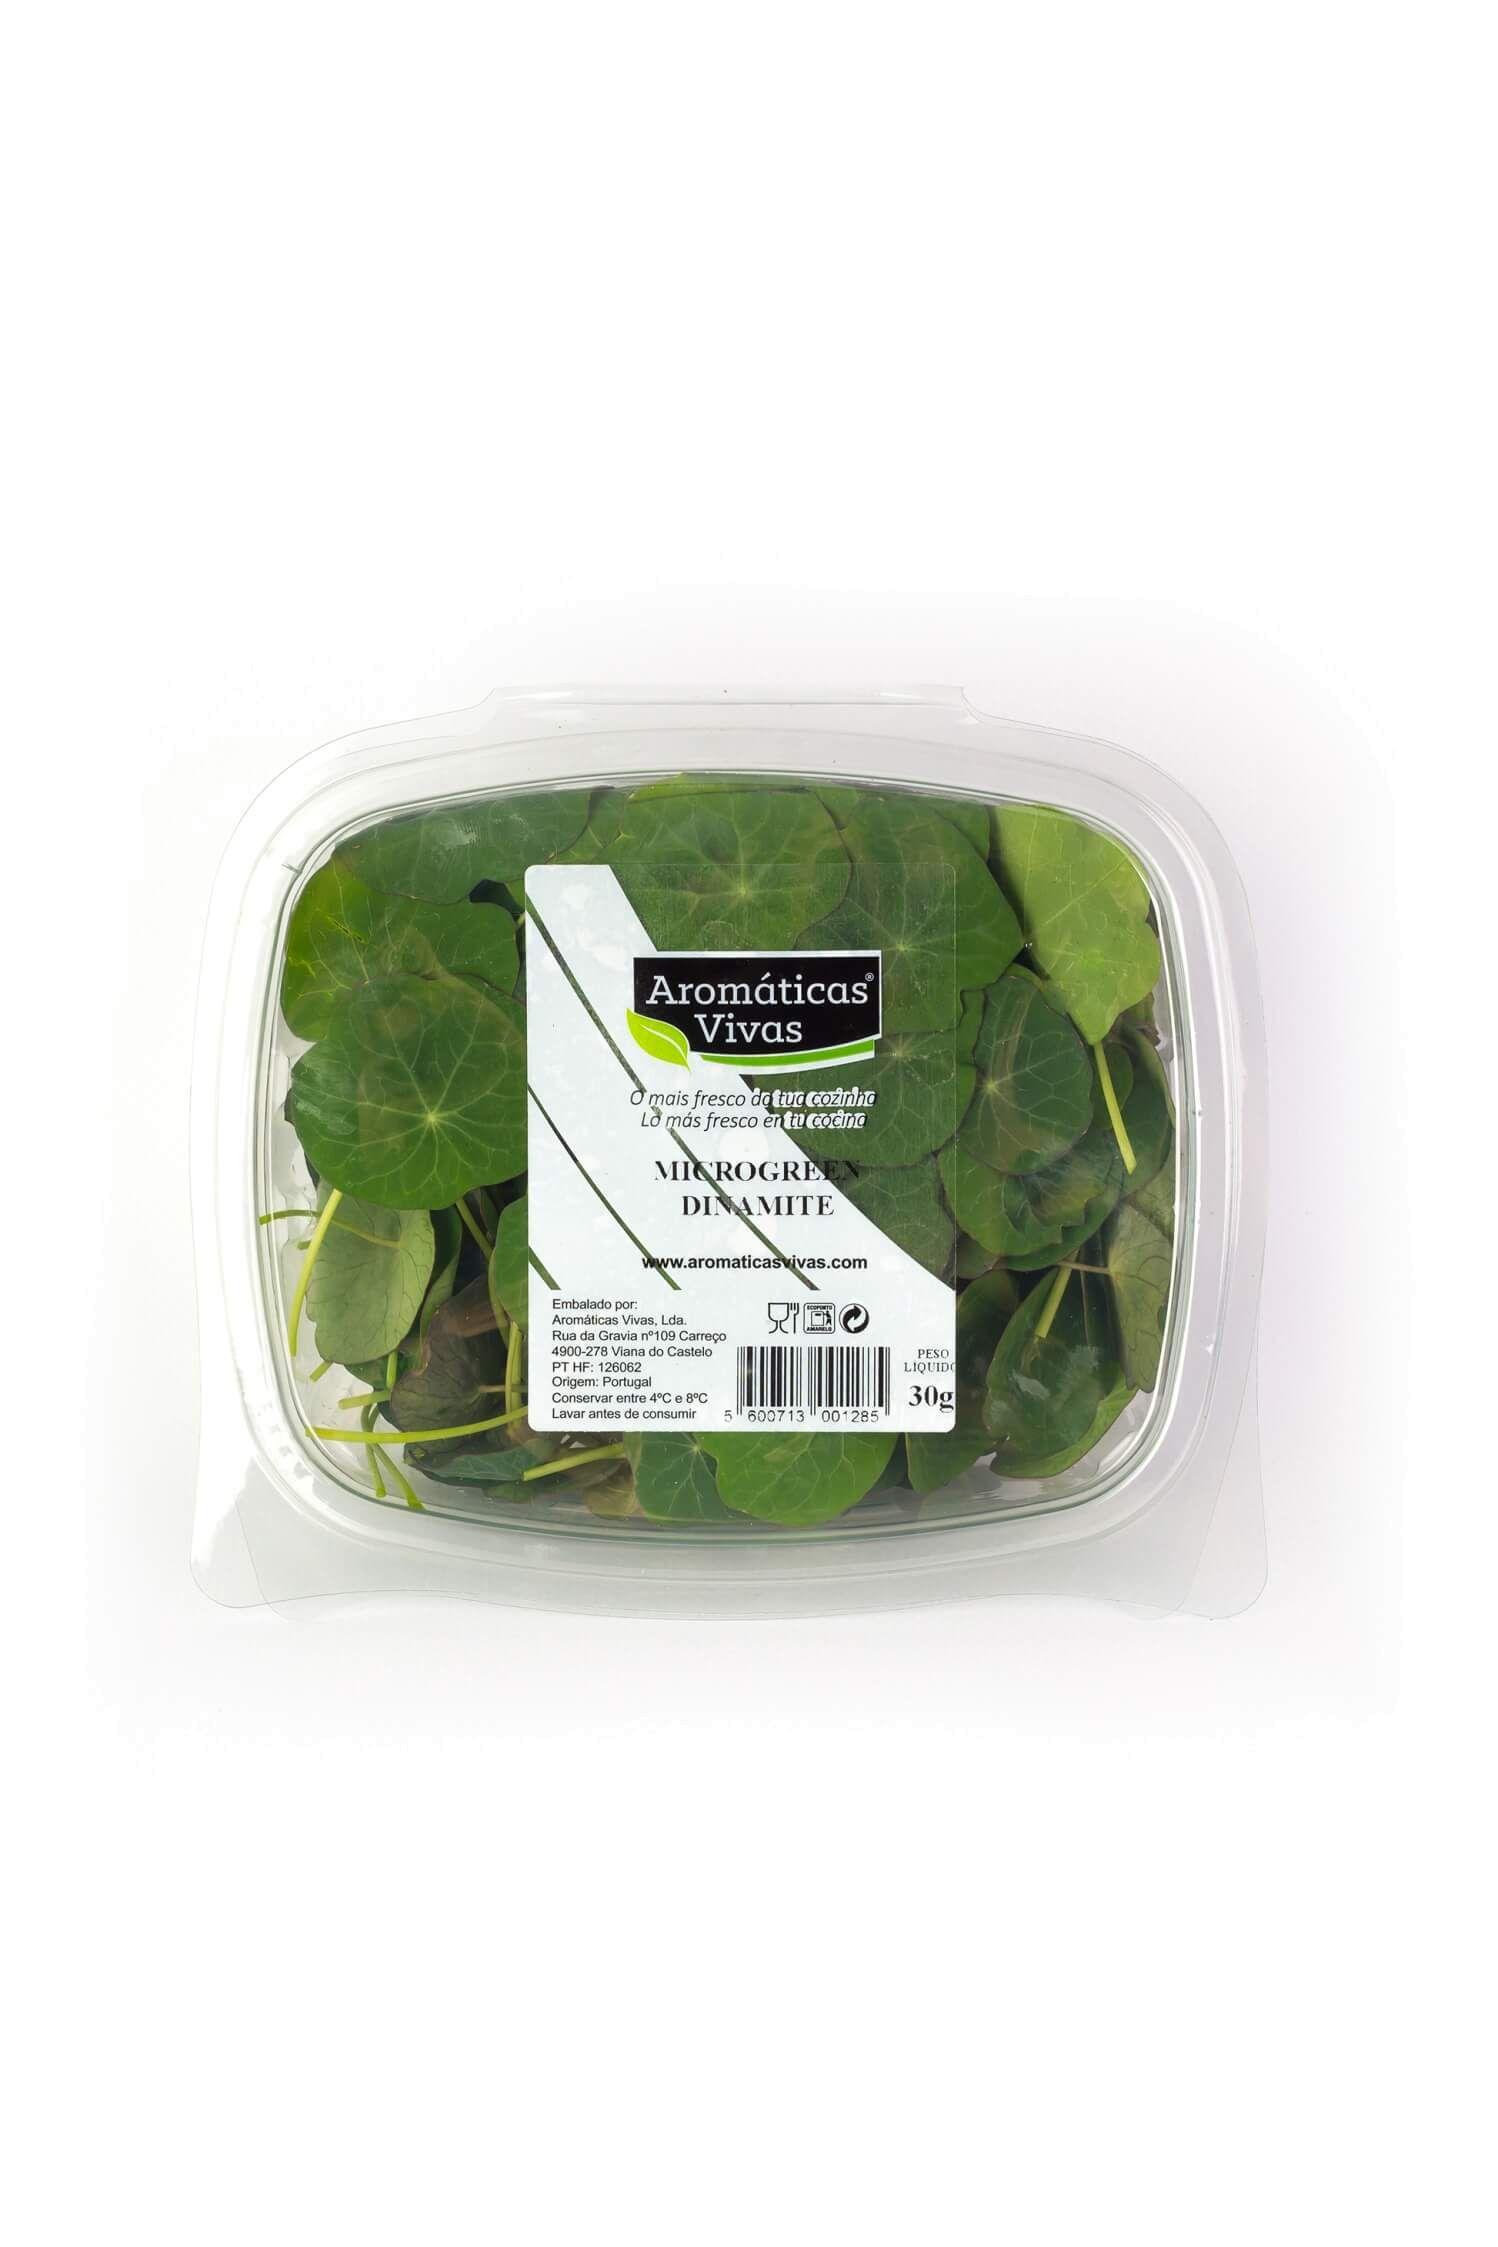 Microgreens Dinamite